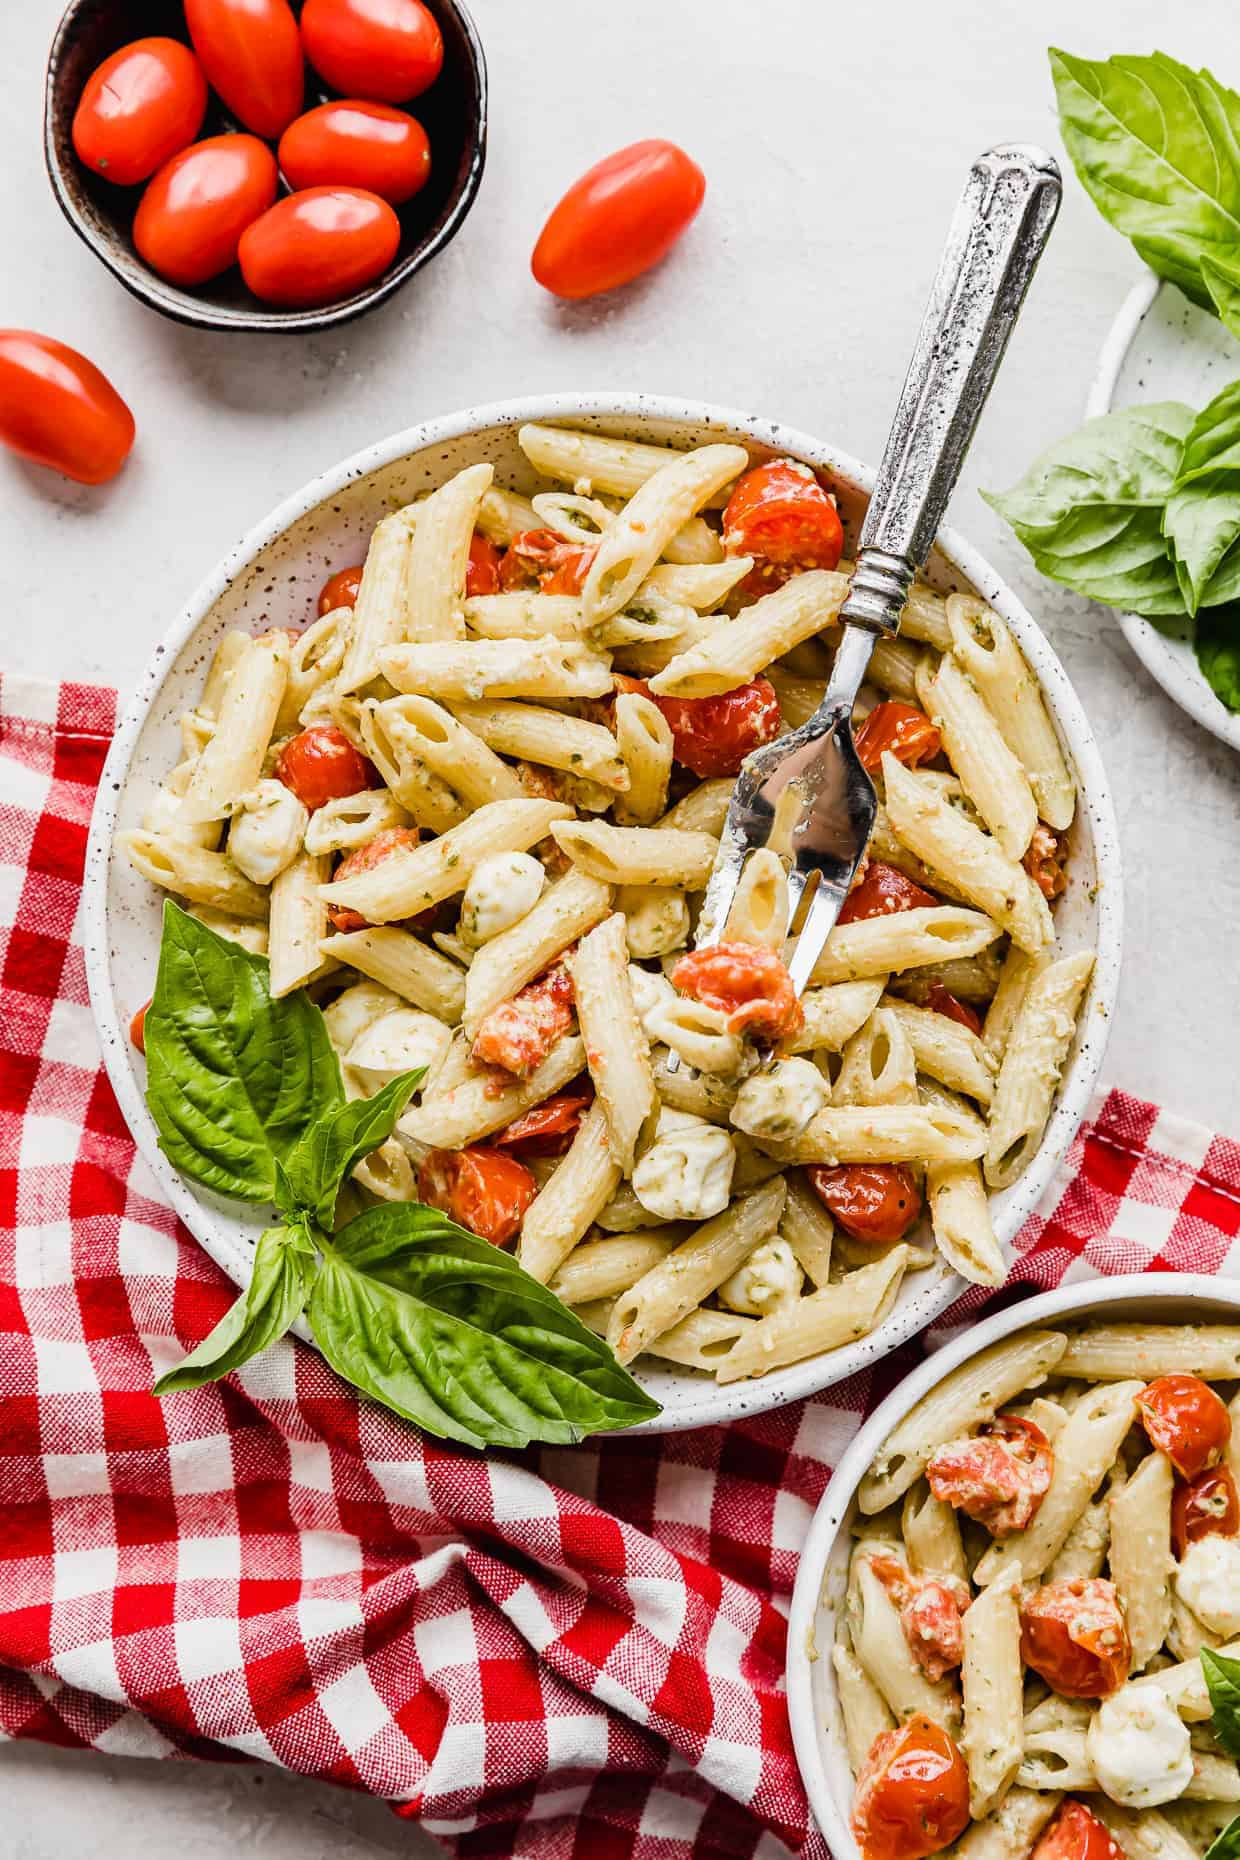 A white plate with Pesto Pasta with Tomatoes and mozzarella balls.